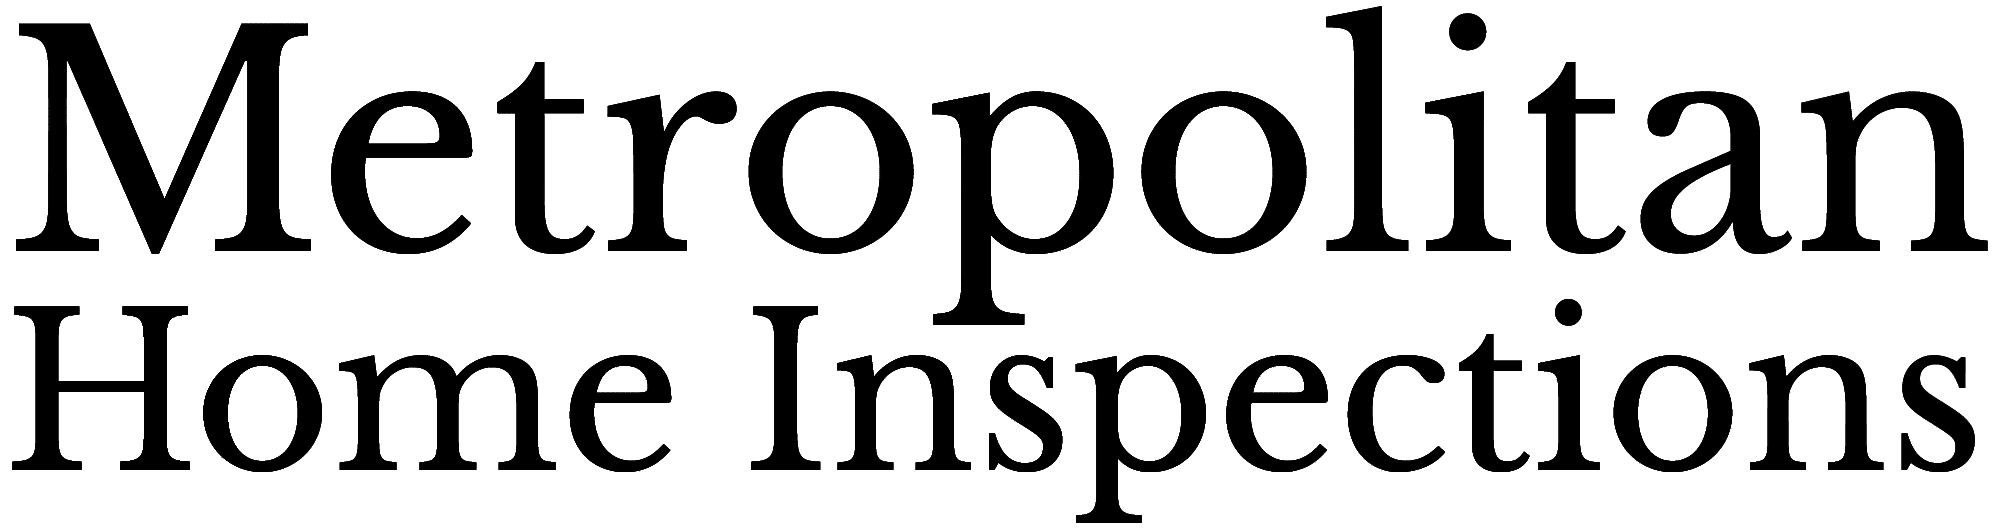 Metropolitan Home Inspections